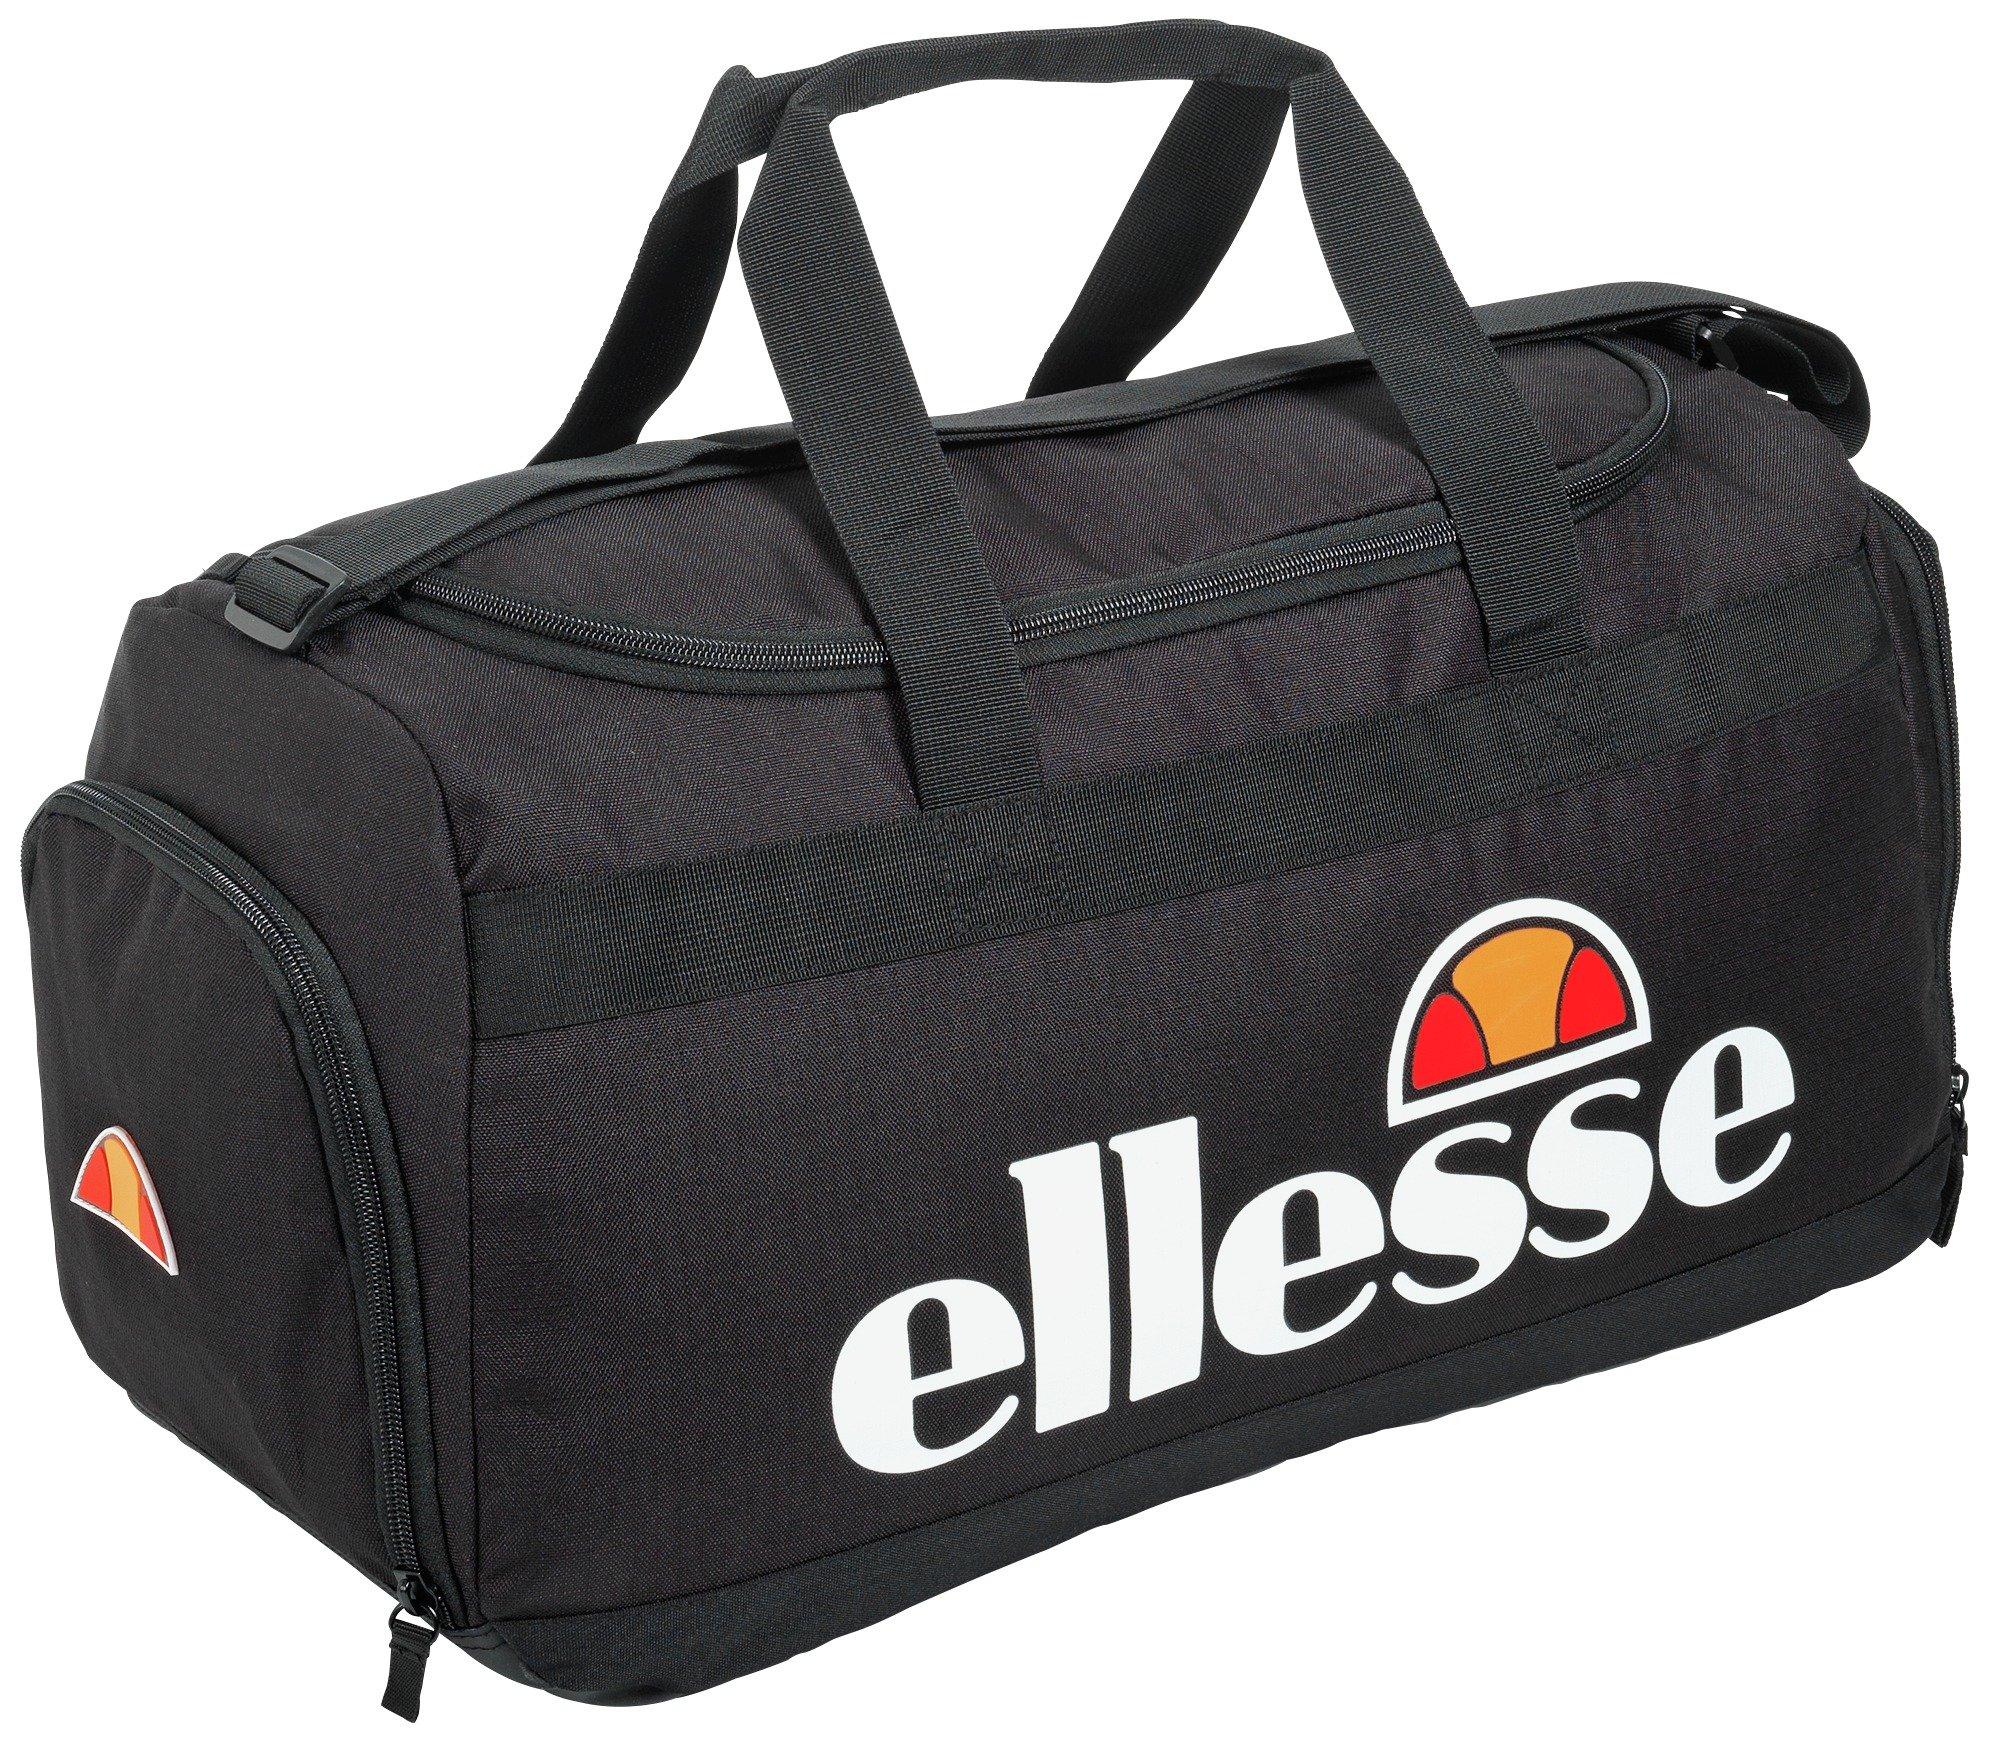 Ellesse Holdall Bag - Black lowest price